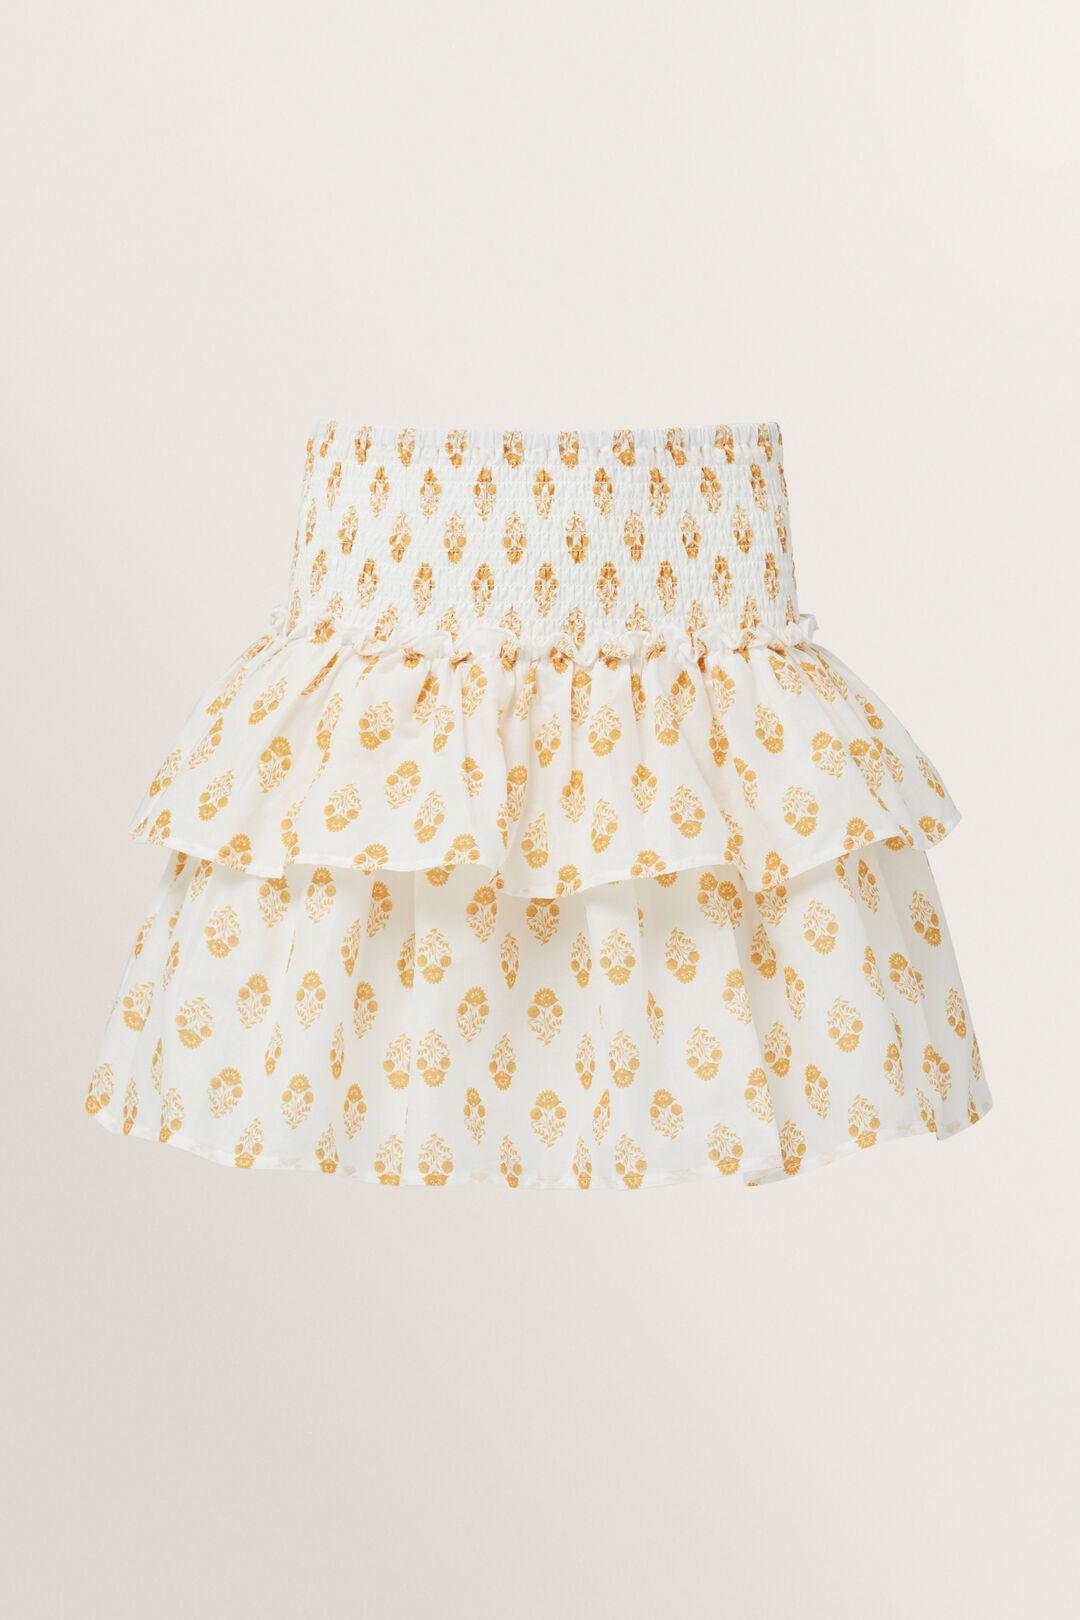 Batik Print Skirt  CHALK  hi-res